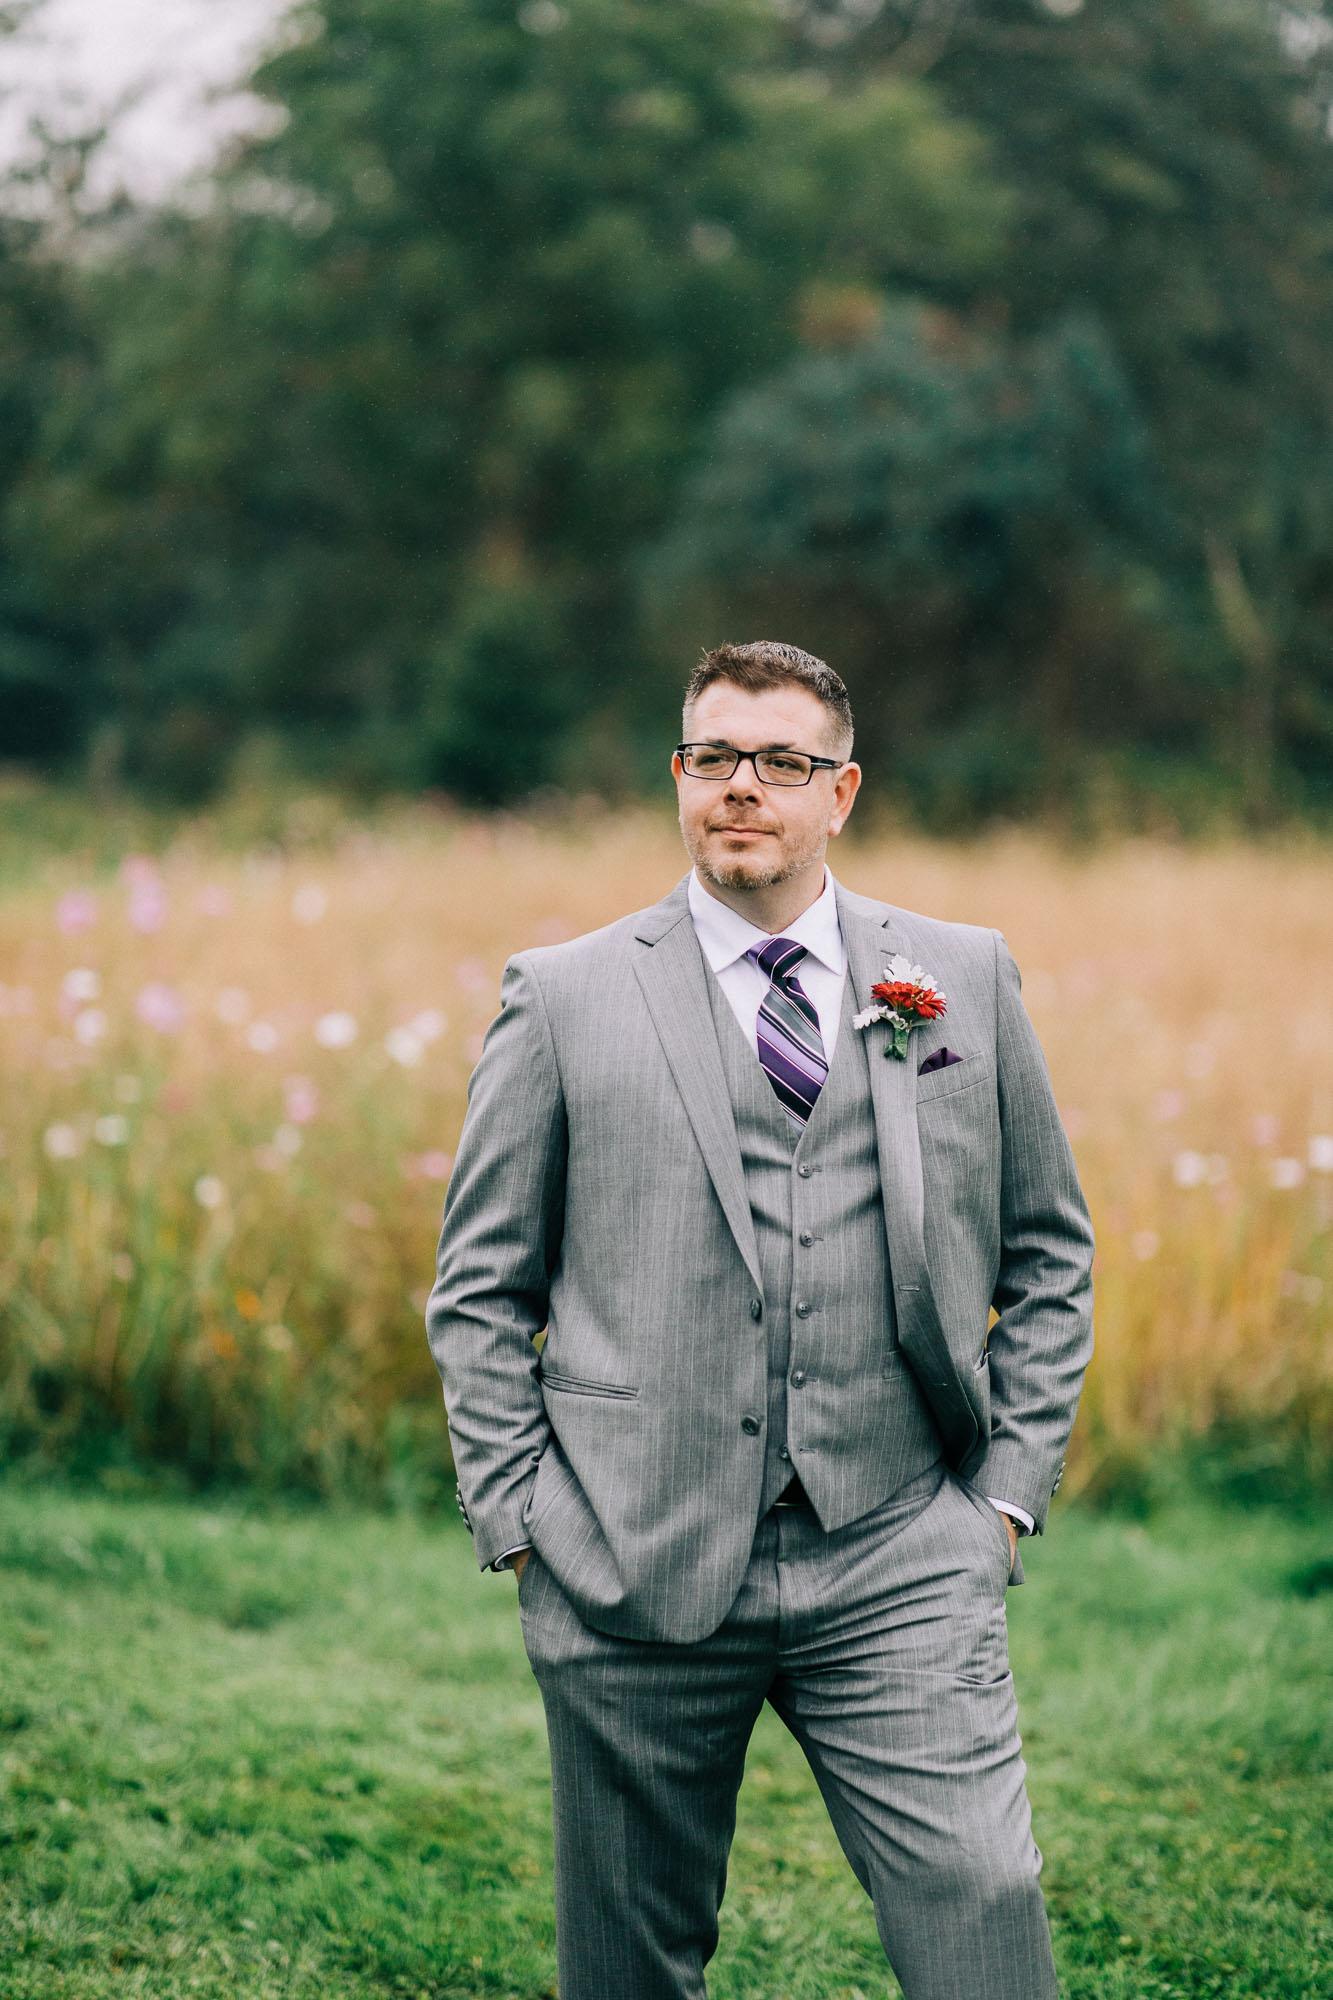 Lodge-at-Raven-Creek-October-wedding-54.jpg